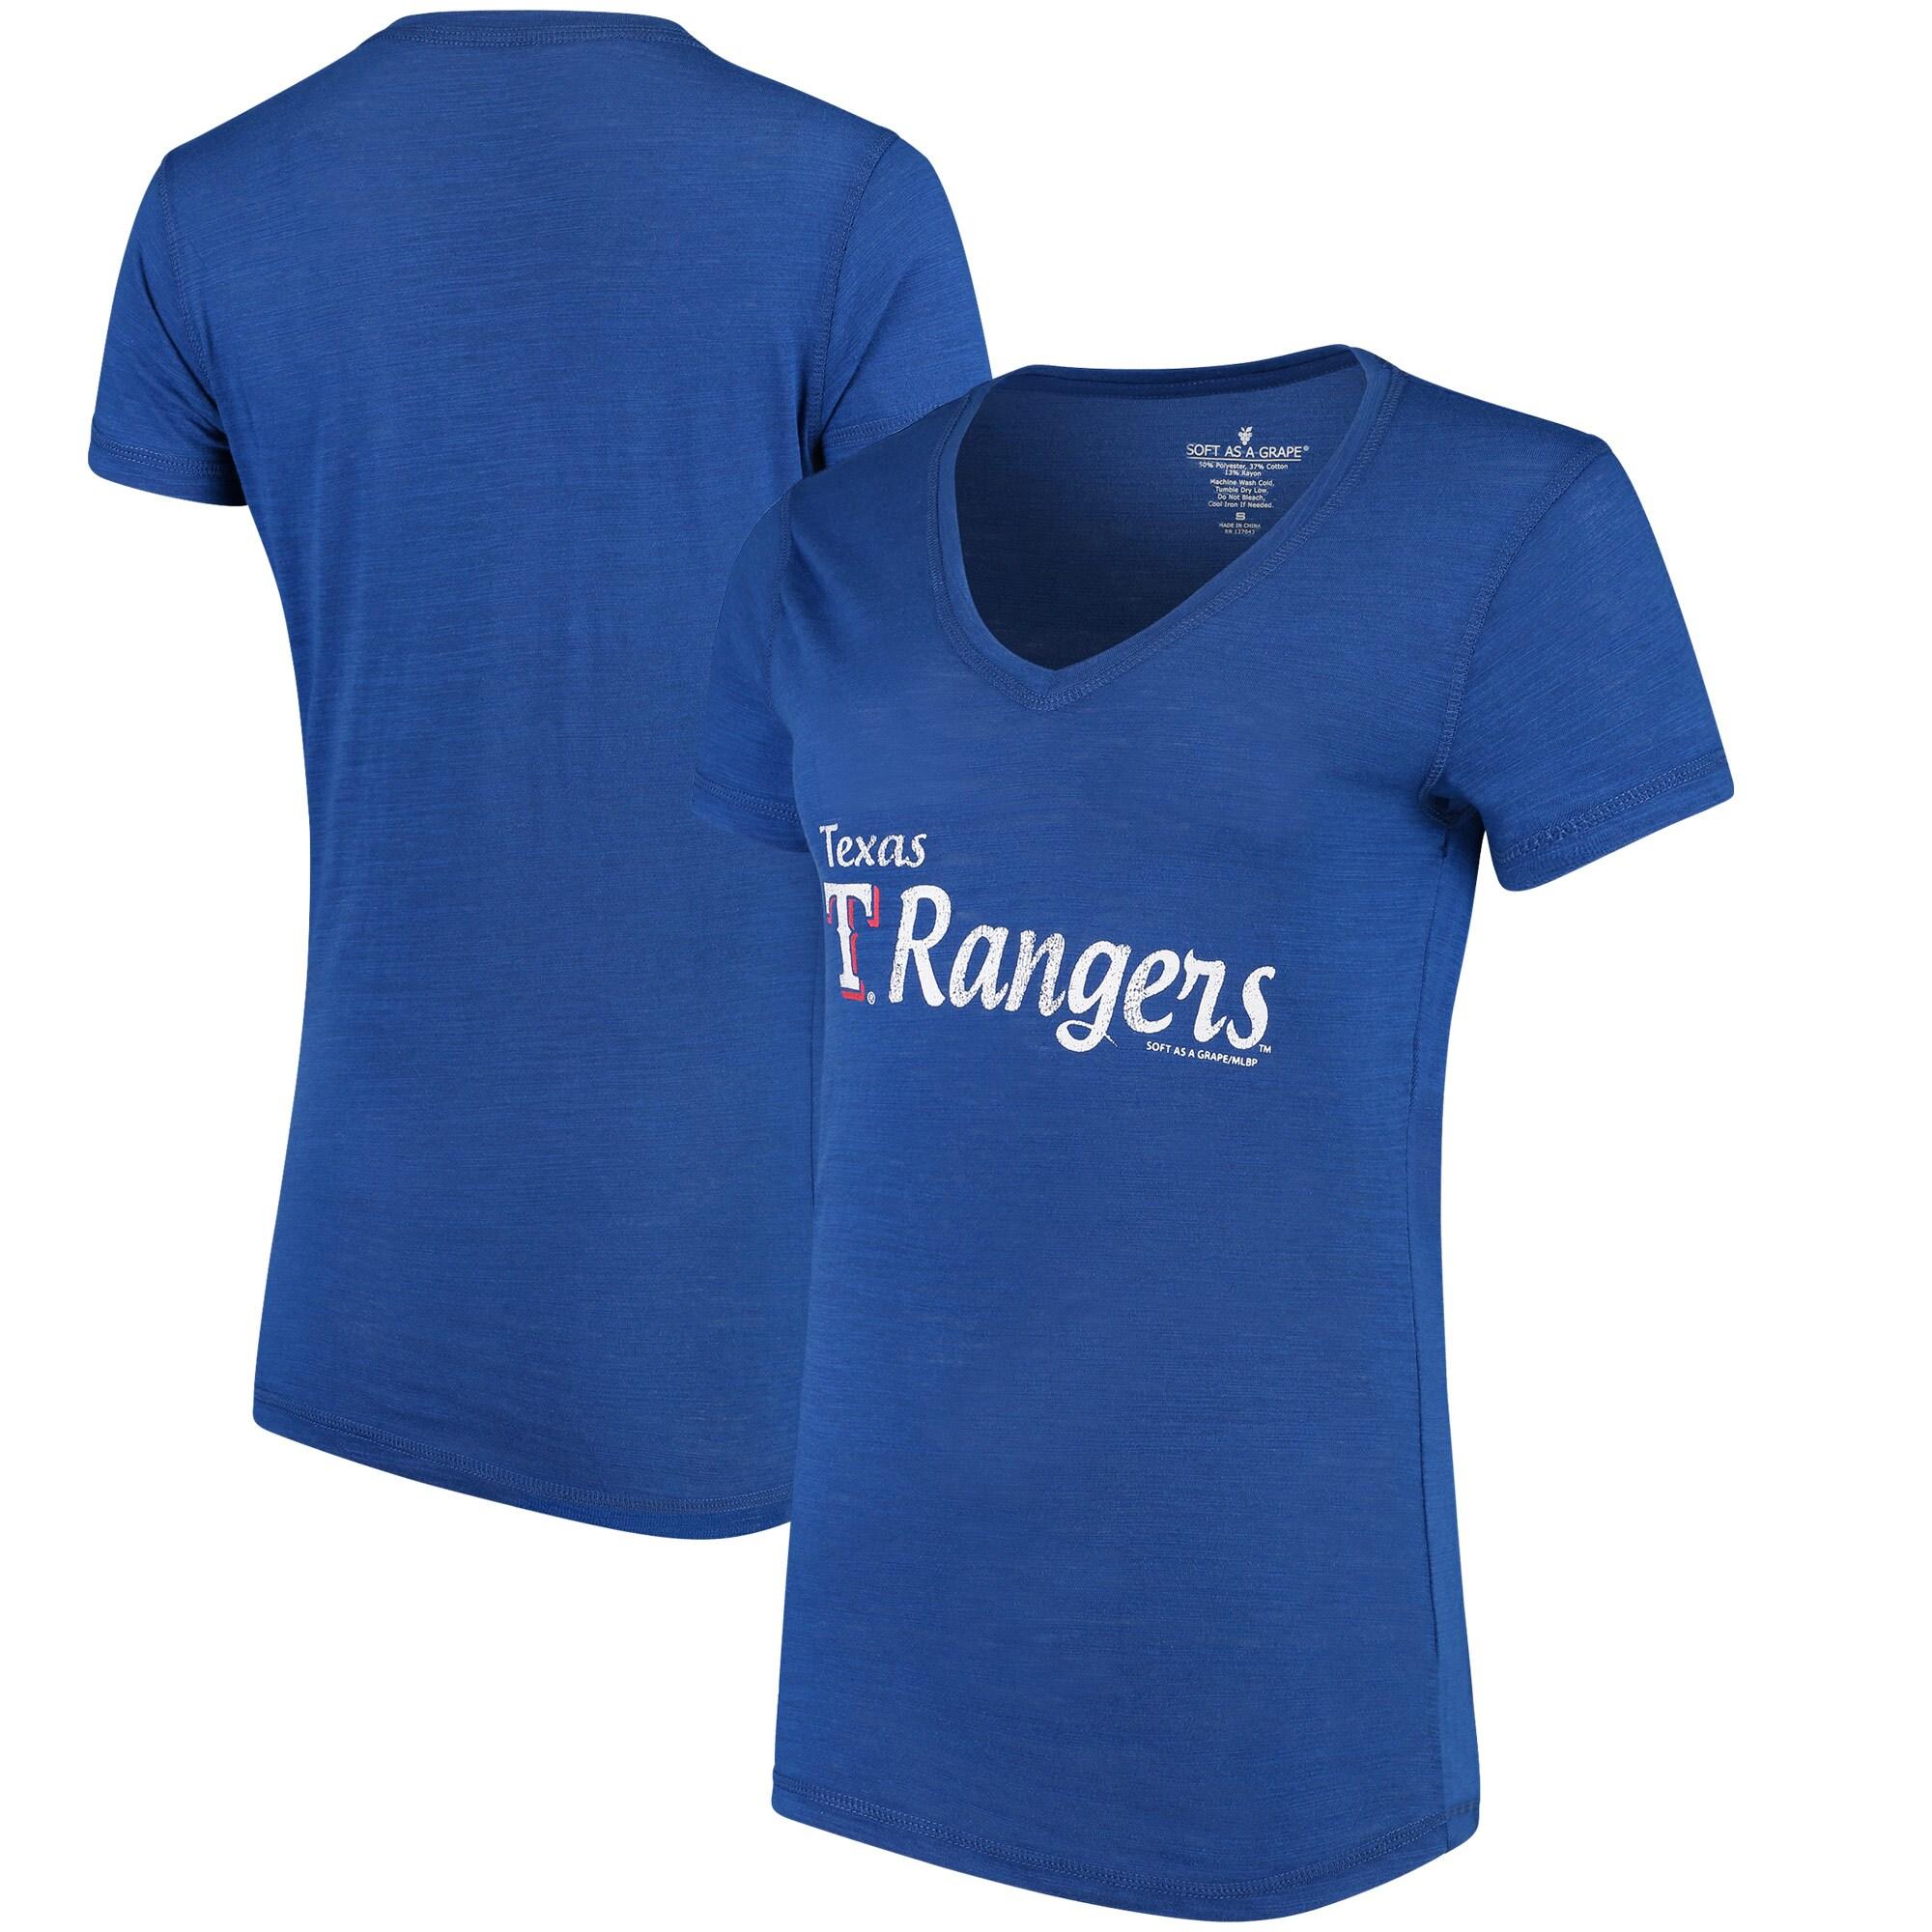 Texas Rangers Soft As A Grape Women's Double Steal Tri-Blend V-Neck T-Shirt - Royal